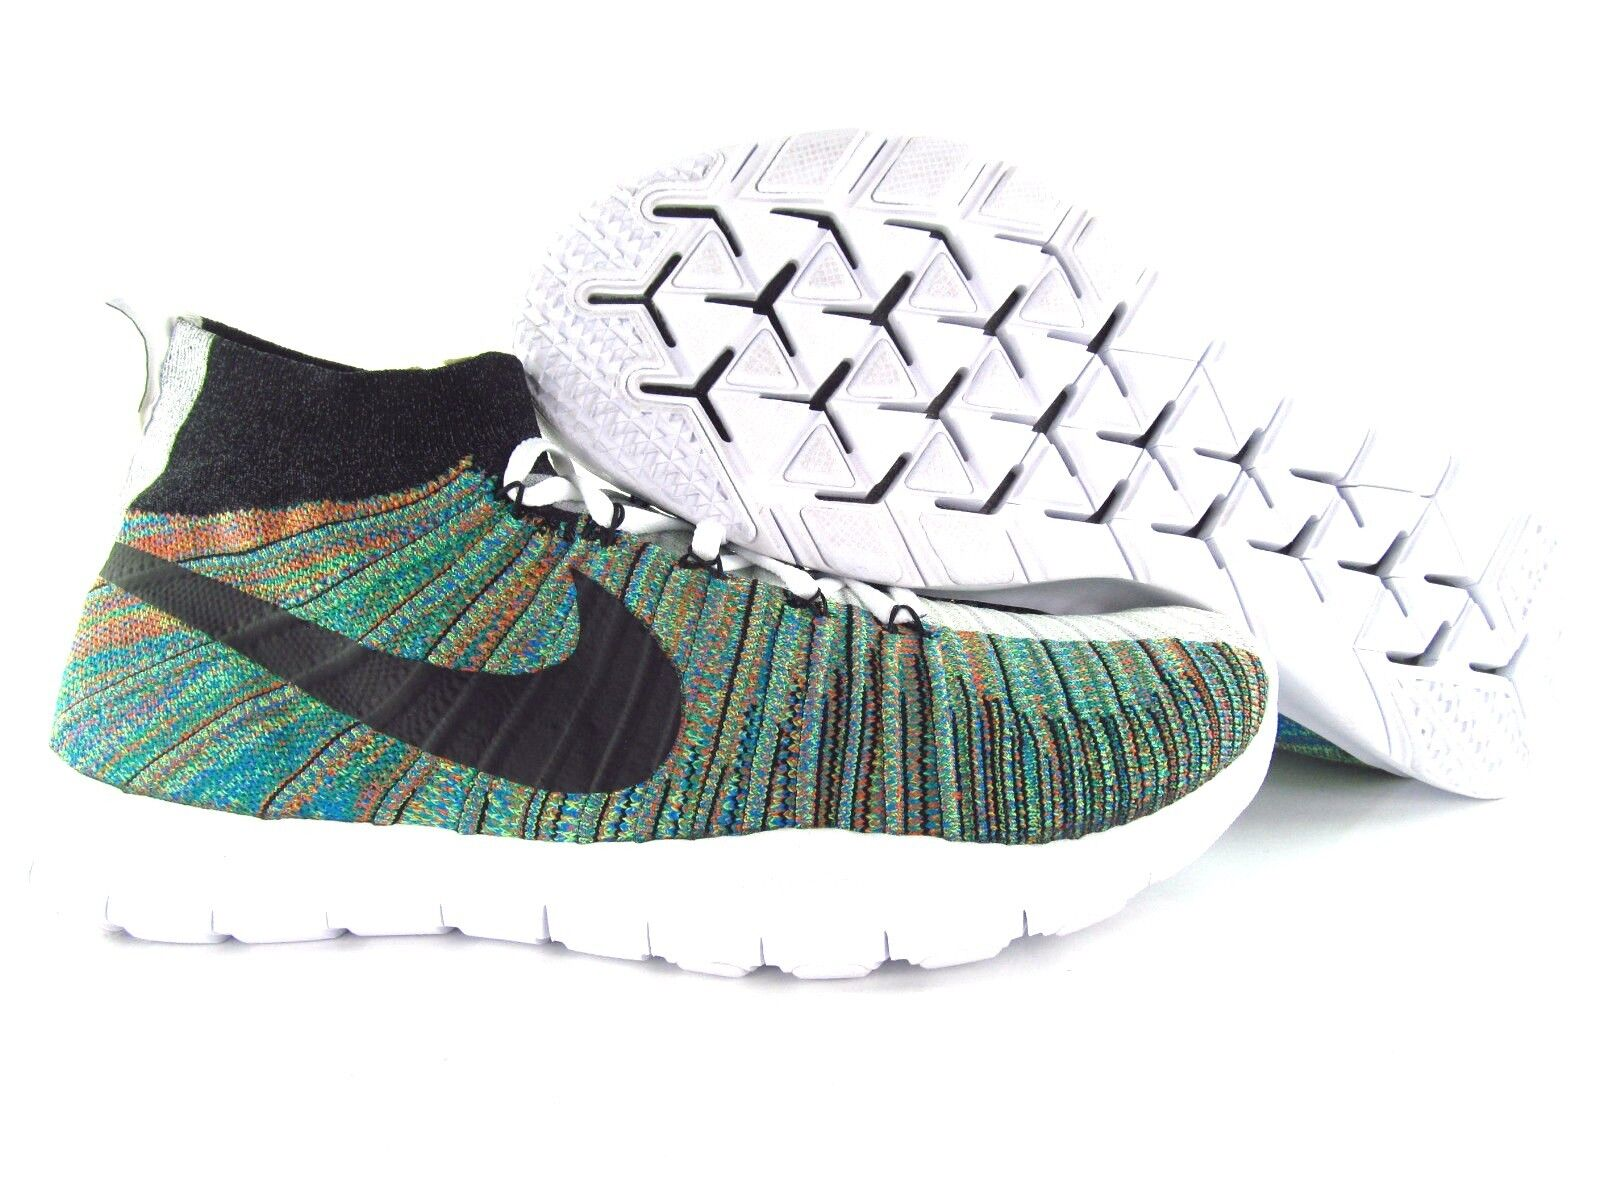 Nike Free TR Force Flyknit Premium Multicolor RT RT RT Riccardo  Tisci US_13  Eur 47.5 f7d191